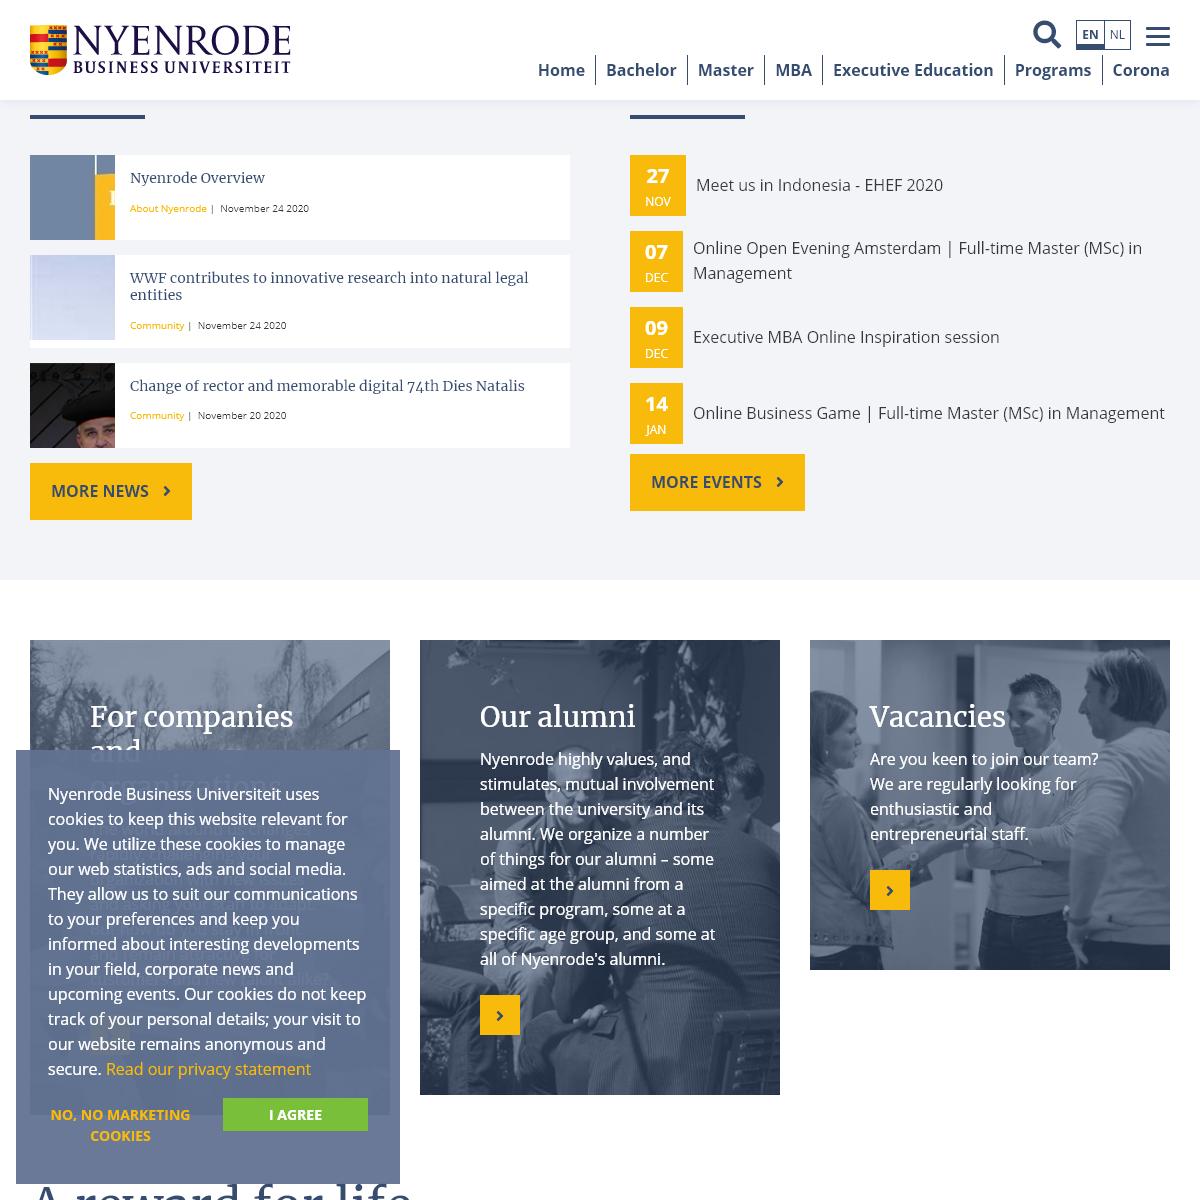 Nyenrode Business Universiteit - a reward for life